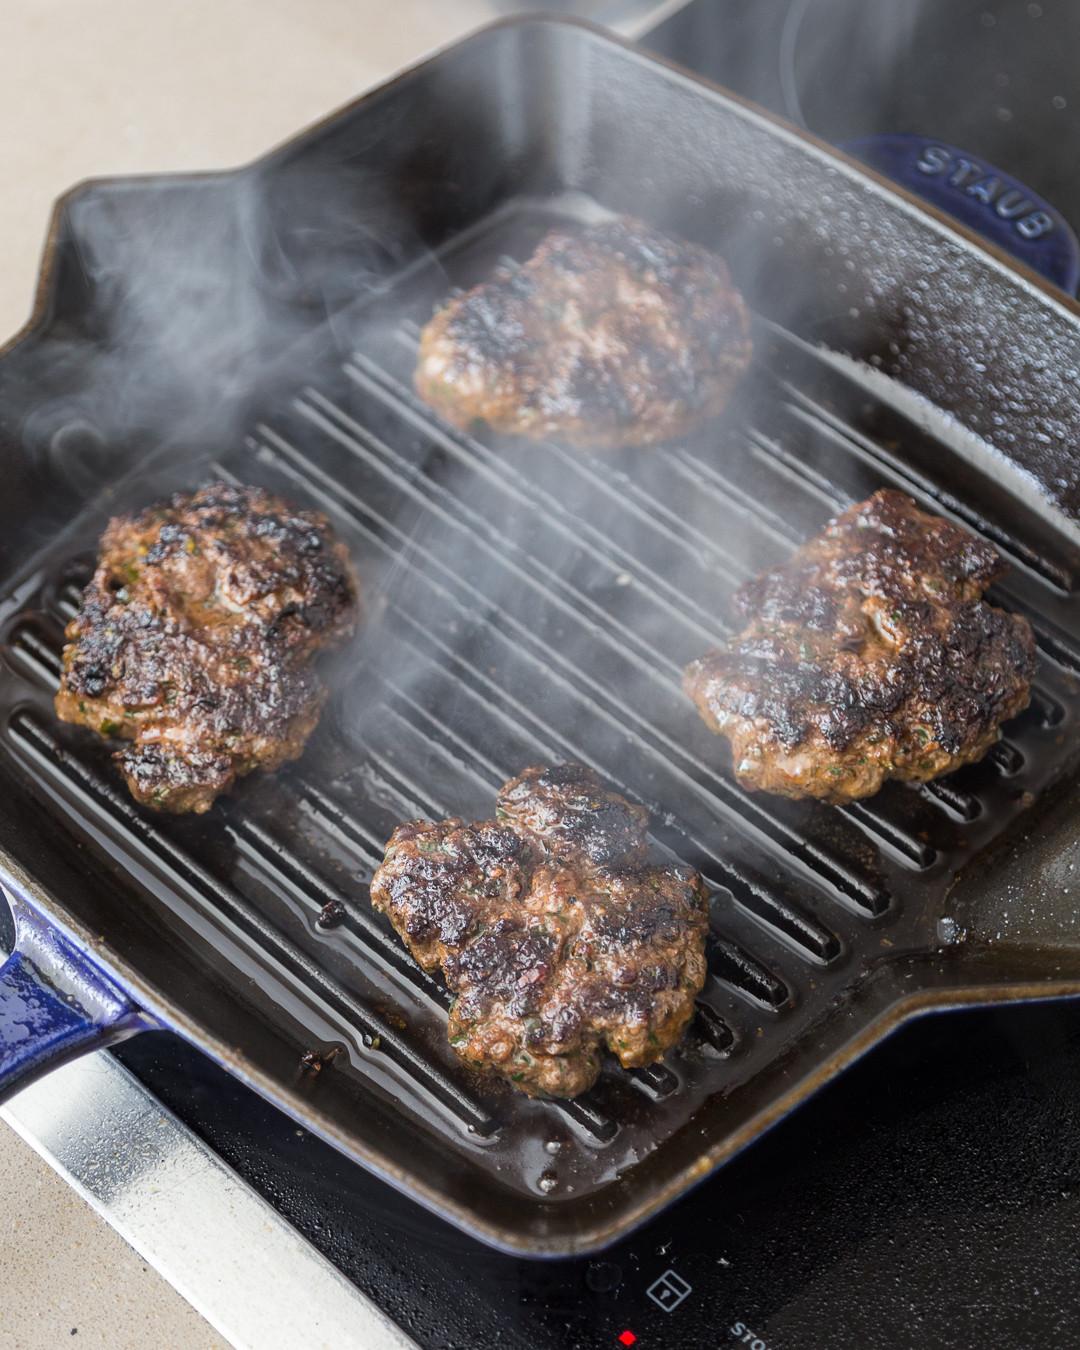 Gourmet Elk Burger Recipes  Whole30 Elk Burger Caramelized ions Dijonnaise Paleo